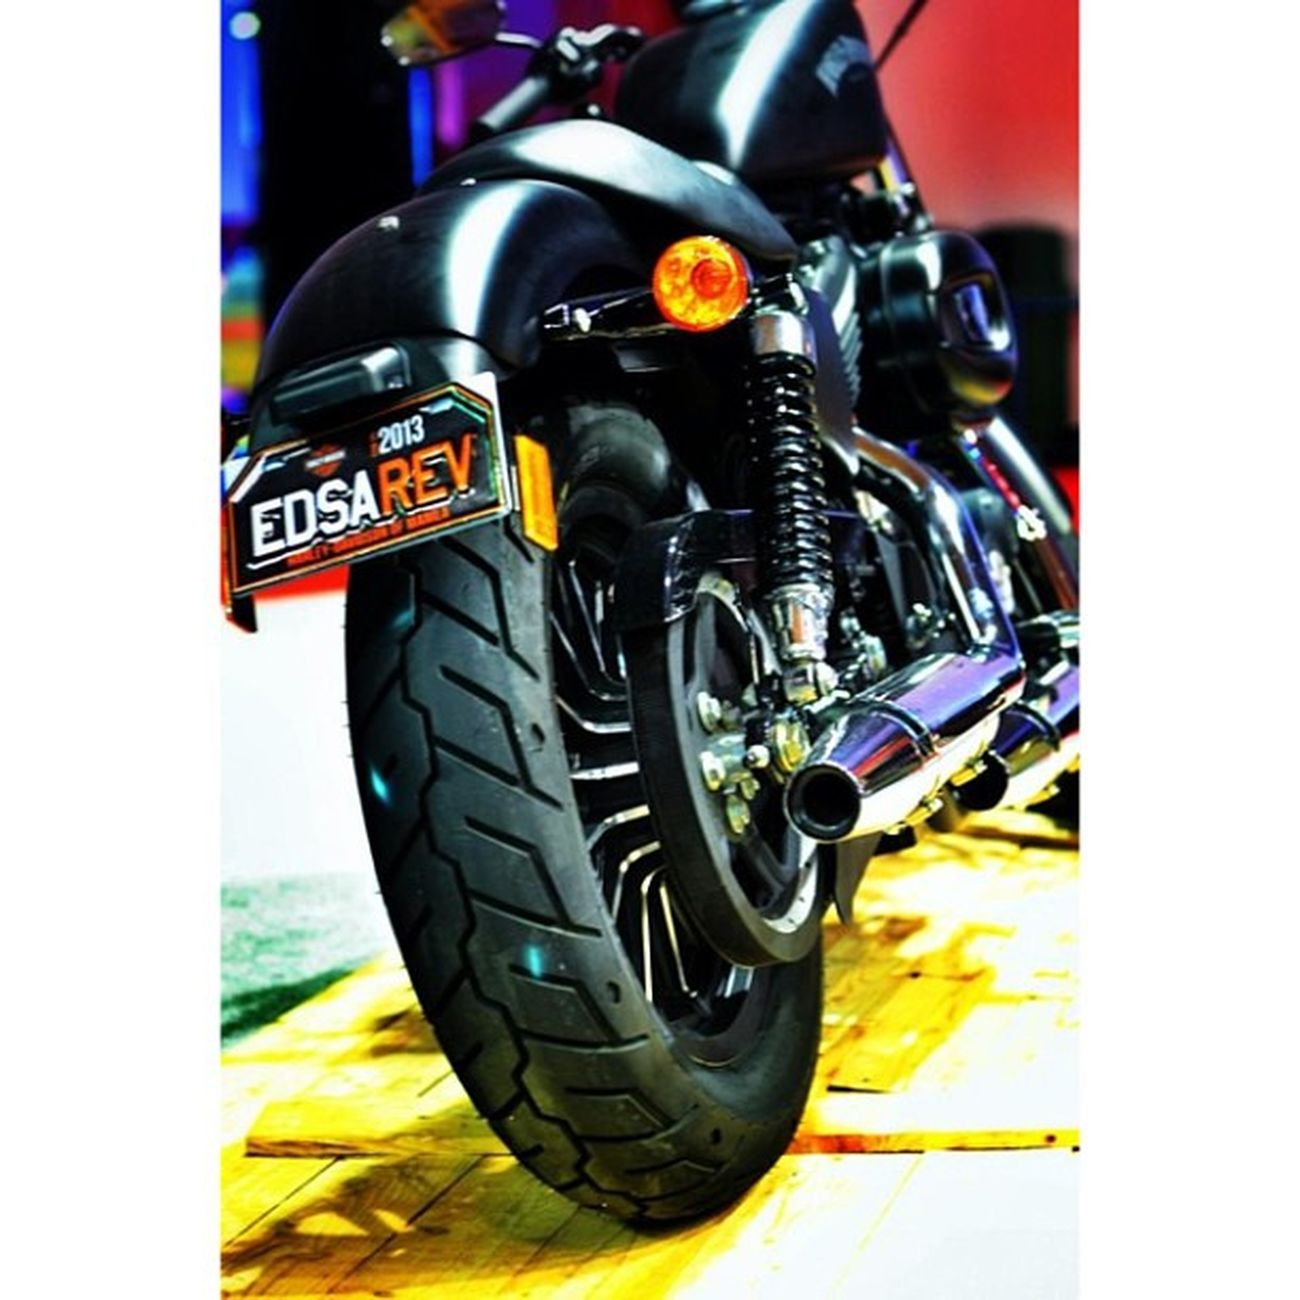 Instafit Beltdrive Slicktires Monsterbikes Edsa